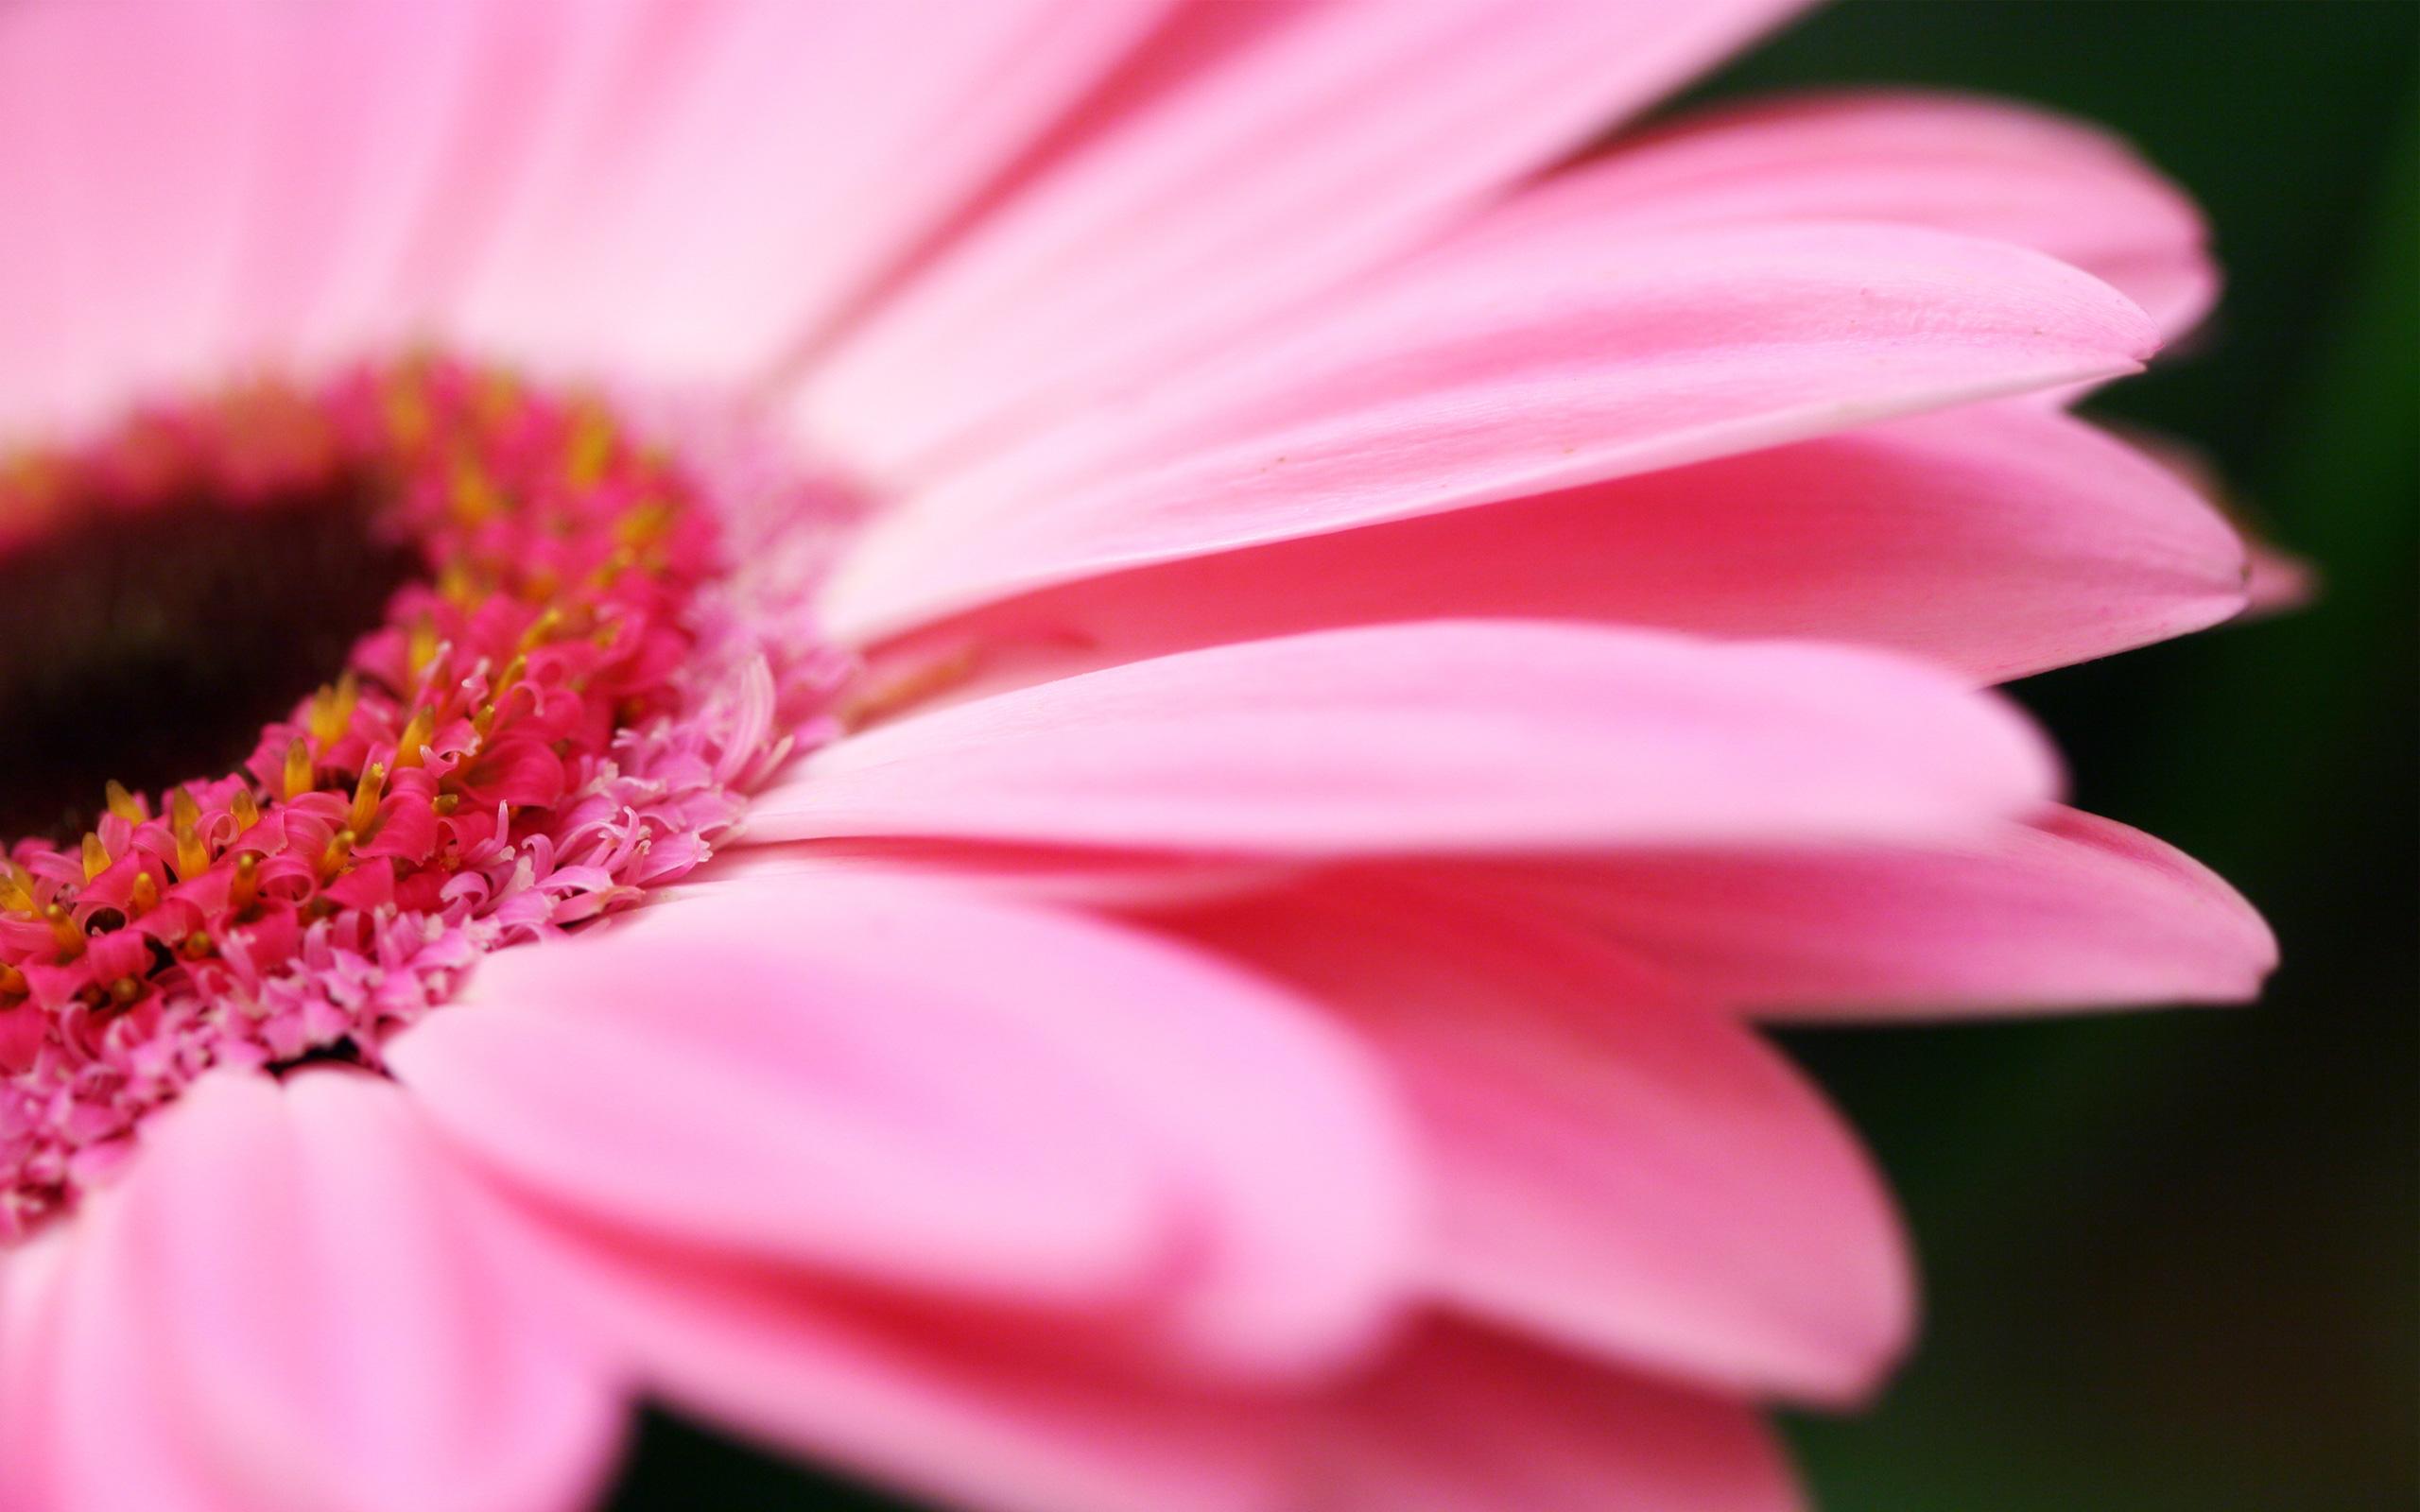 Flower Pink Petals Photo #6935960